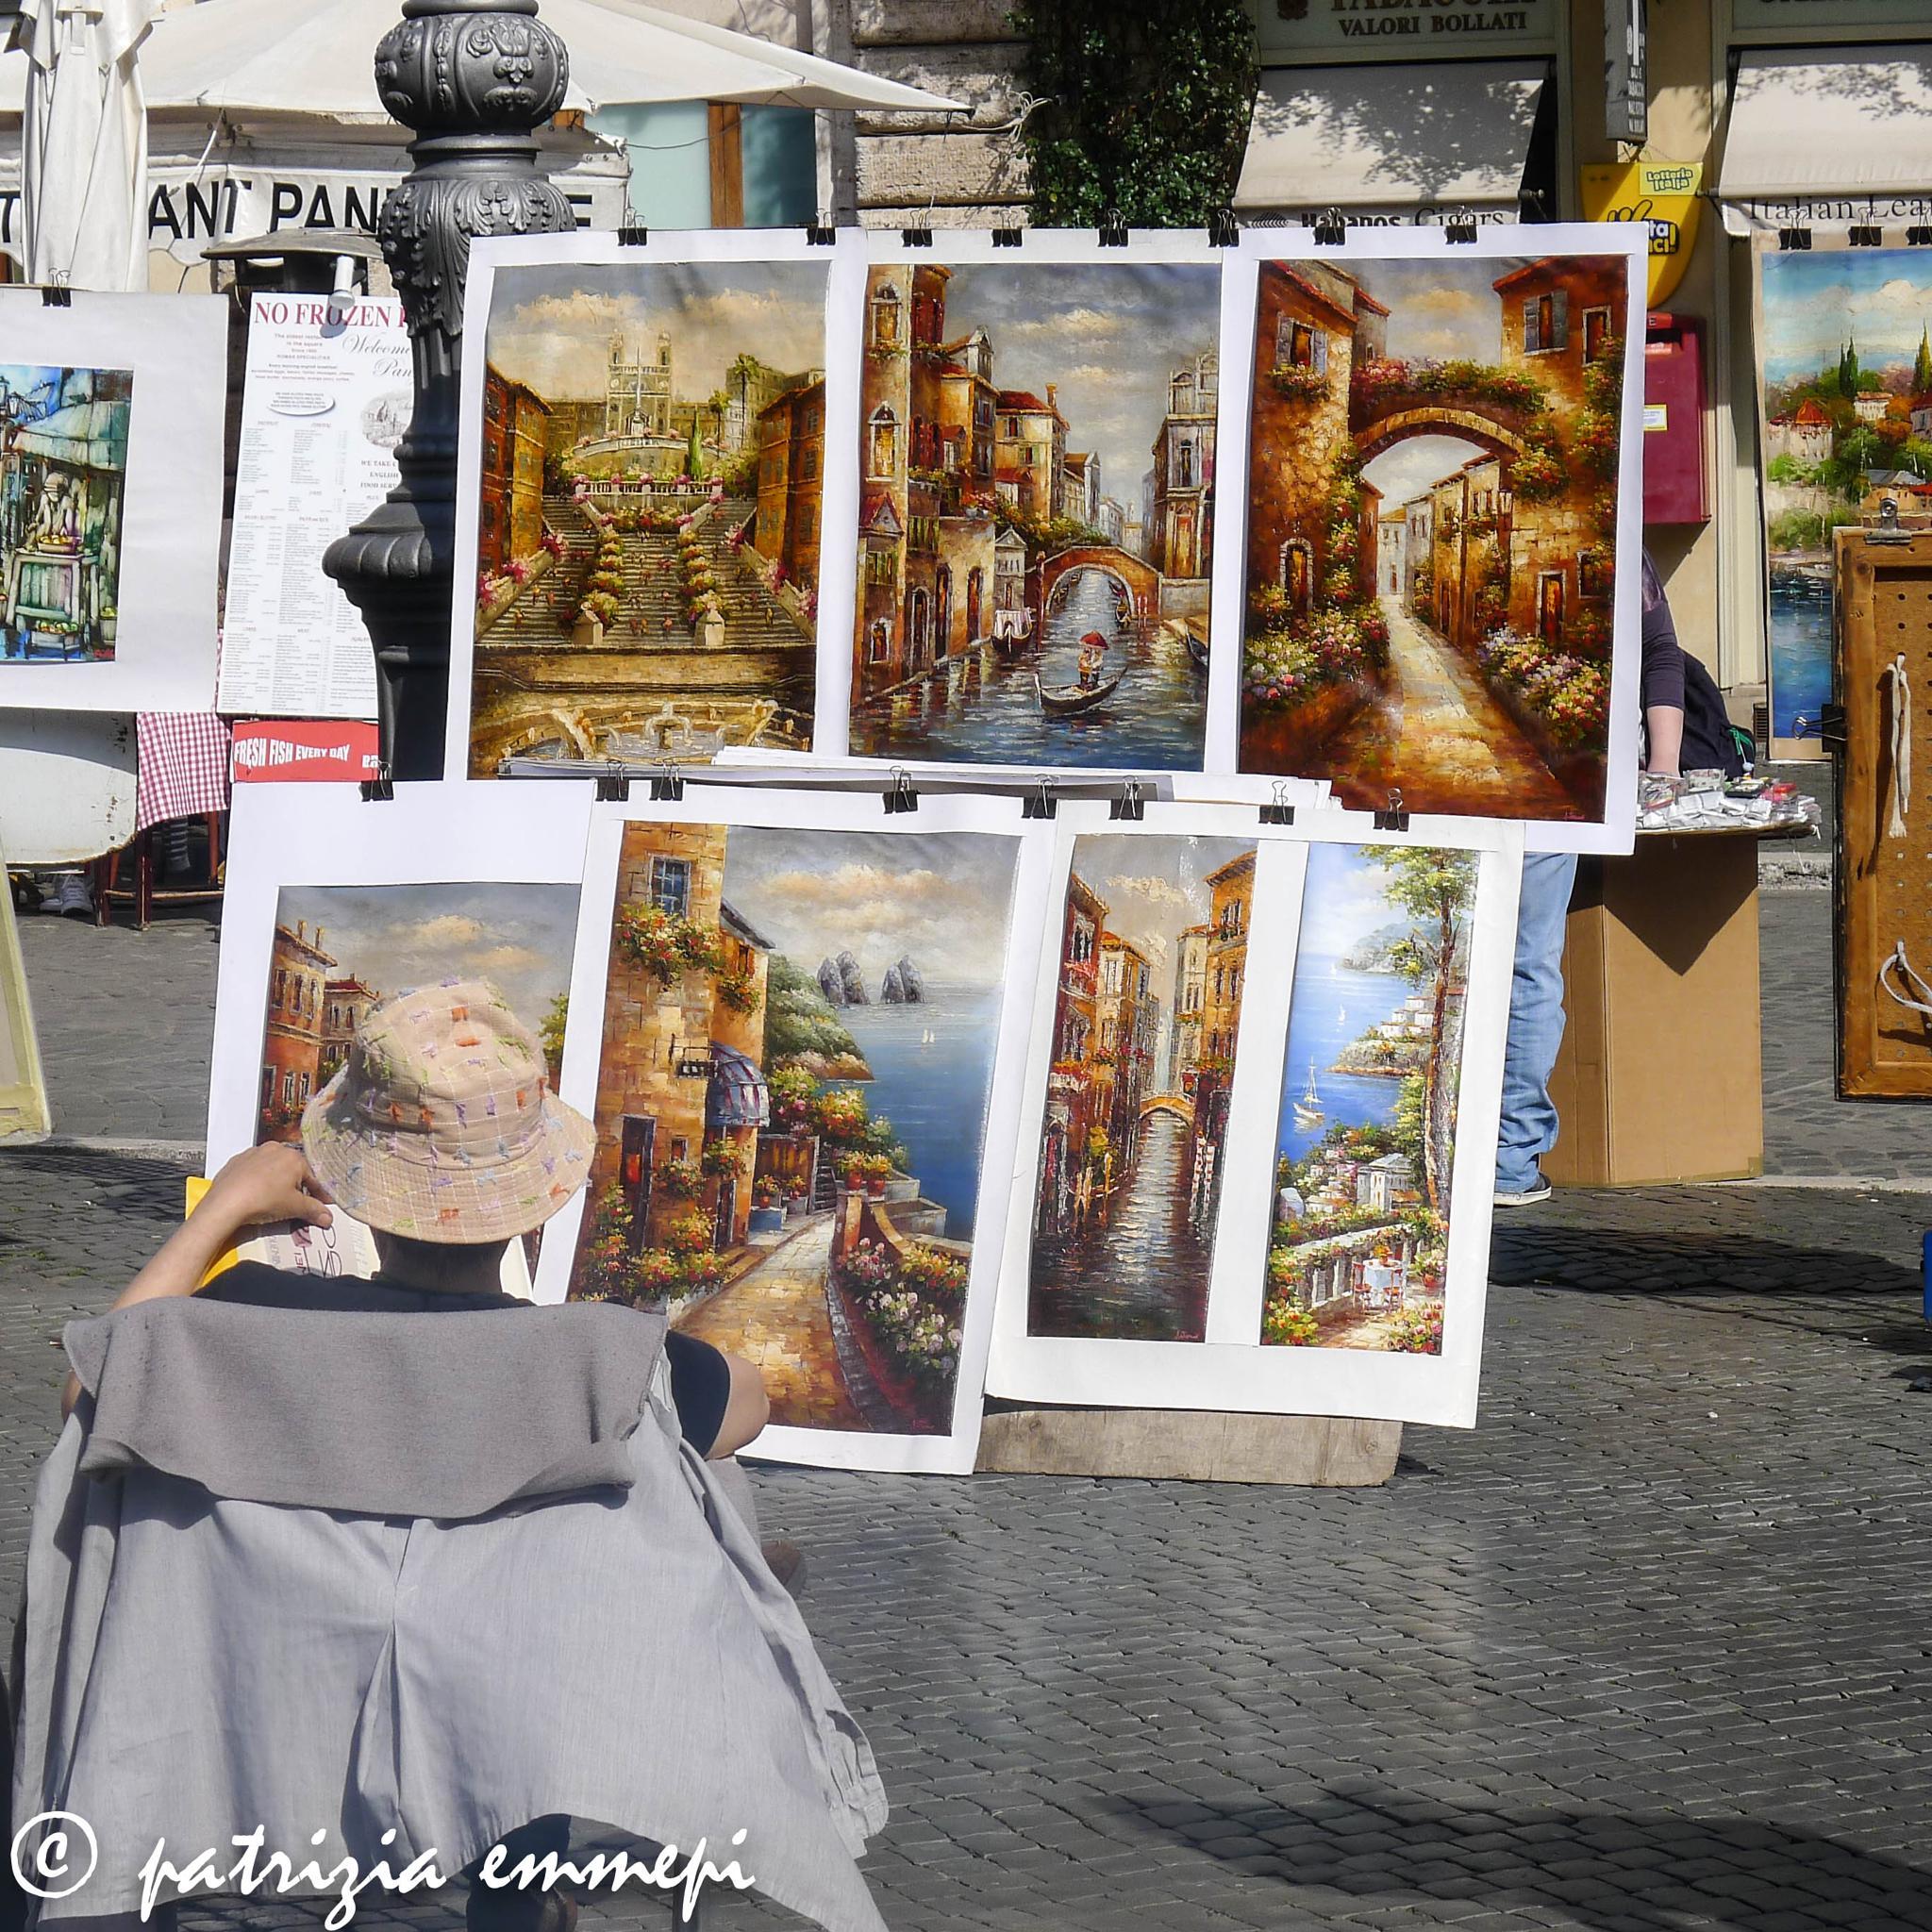 osservando l'arte by Patrizia Emmepi